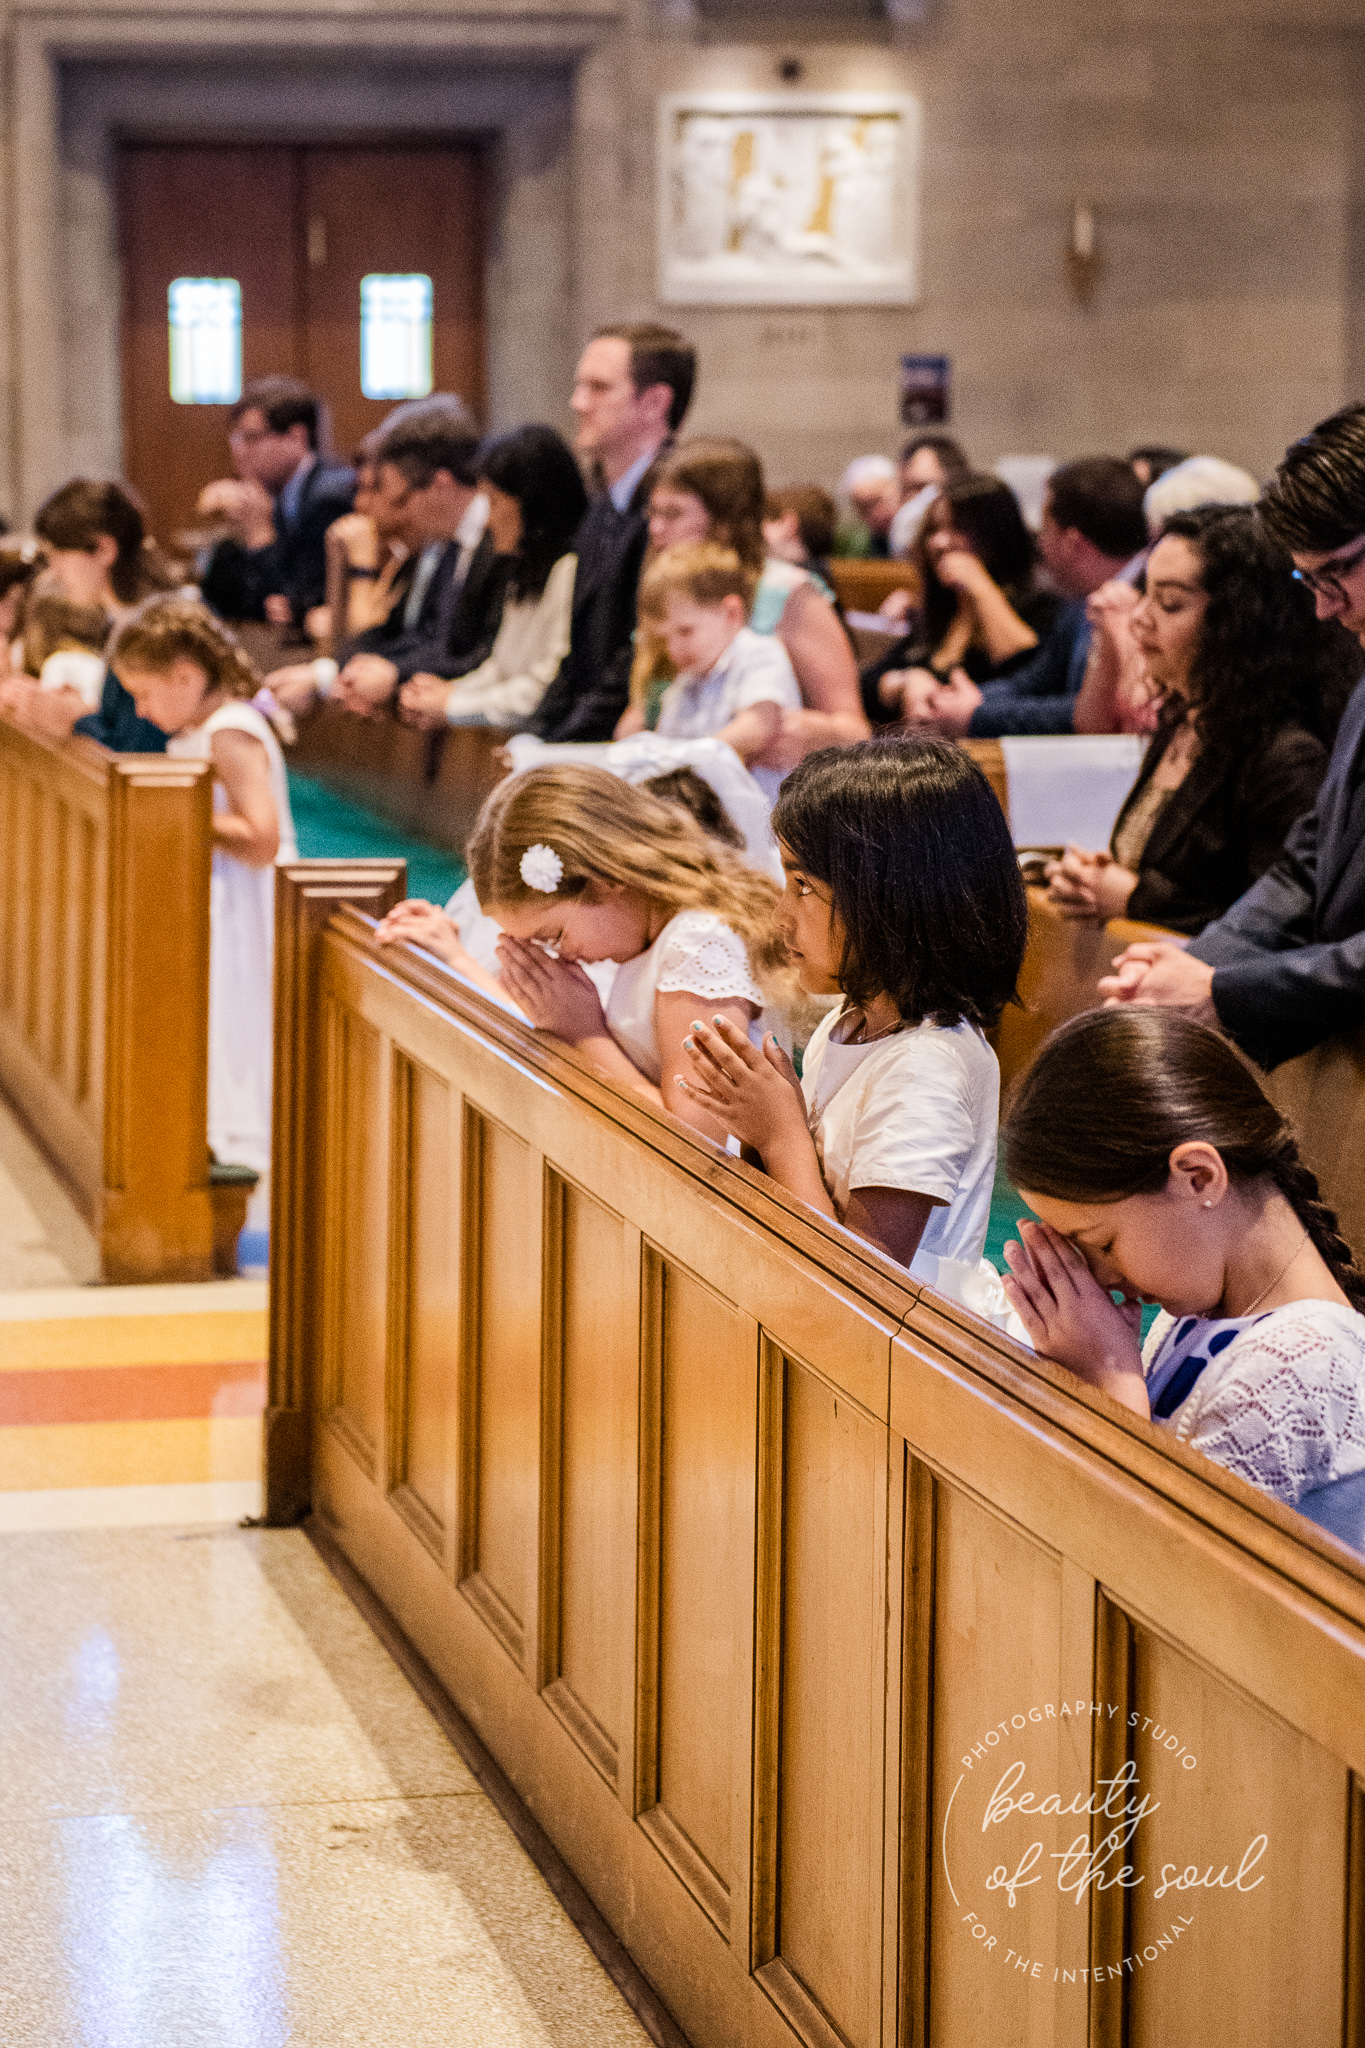 washington-dc-st-ann-catholic-church-first-holy-communion-beauty-of-the-soul-studio-may-2019-15.jpg